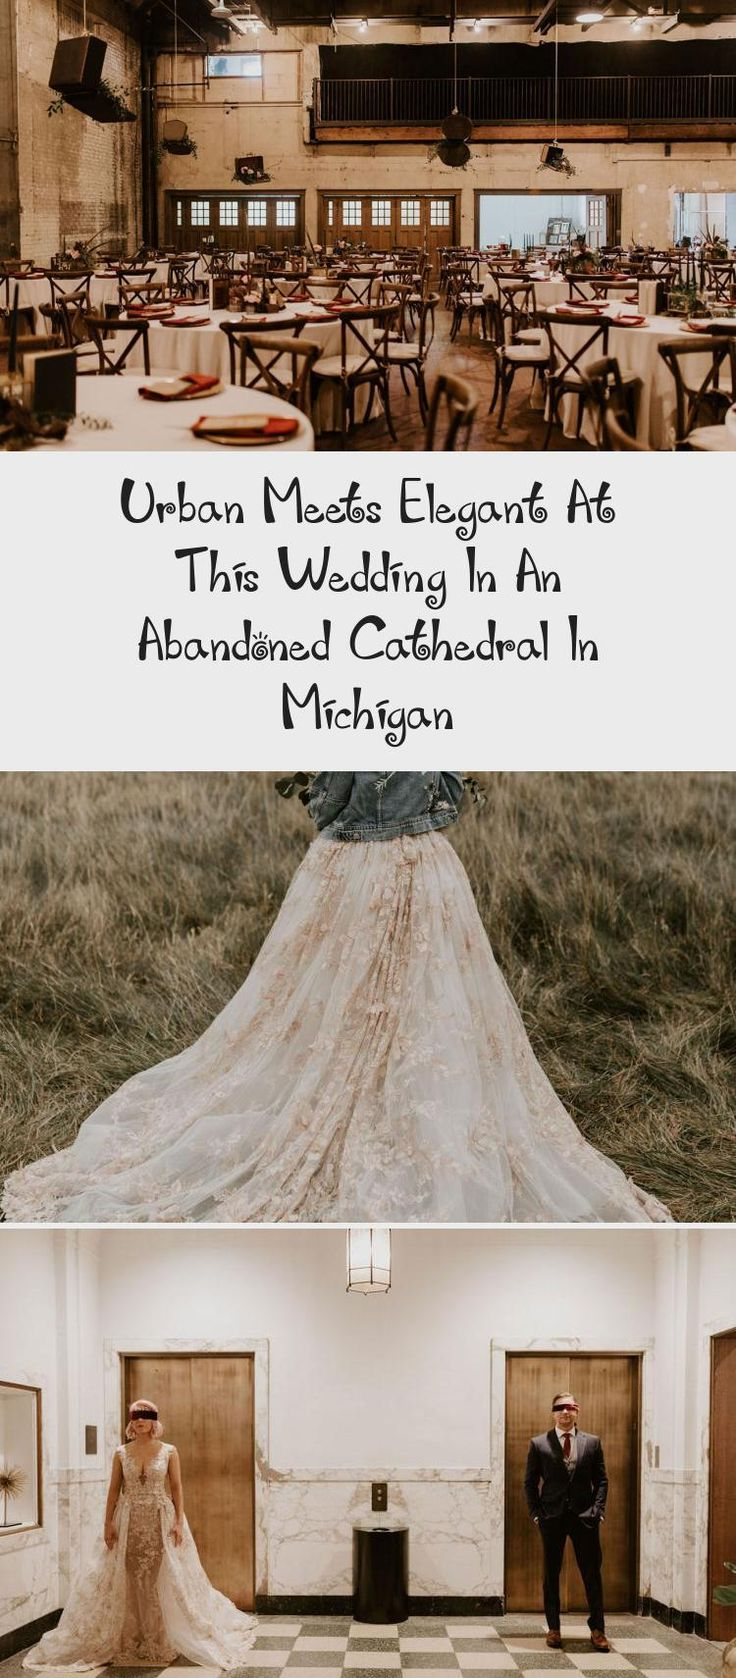 Urban Meets Elegant at this Wedding in an Abandoned Cathedral in Michigan - Green Wedding Shoes #MermaidBridesmaidDresses #SatinBridesmaidDresses #LilacBridesmaidDresses #MixAndMatchBridesmaidDresses #BlackBridesmaidDresses